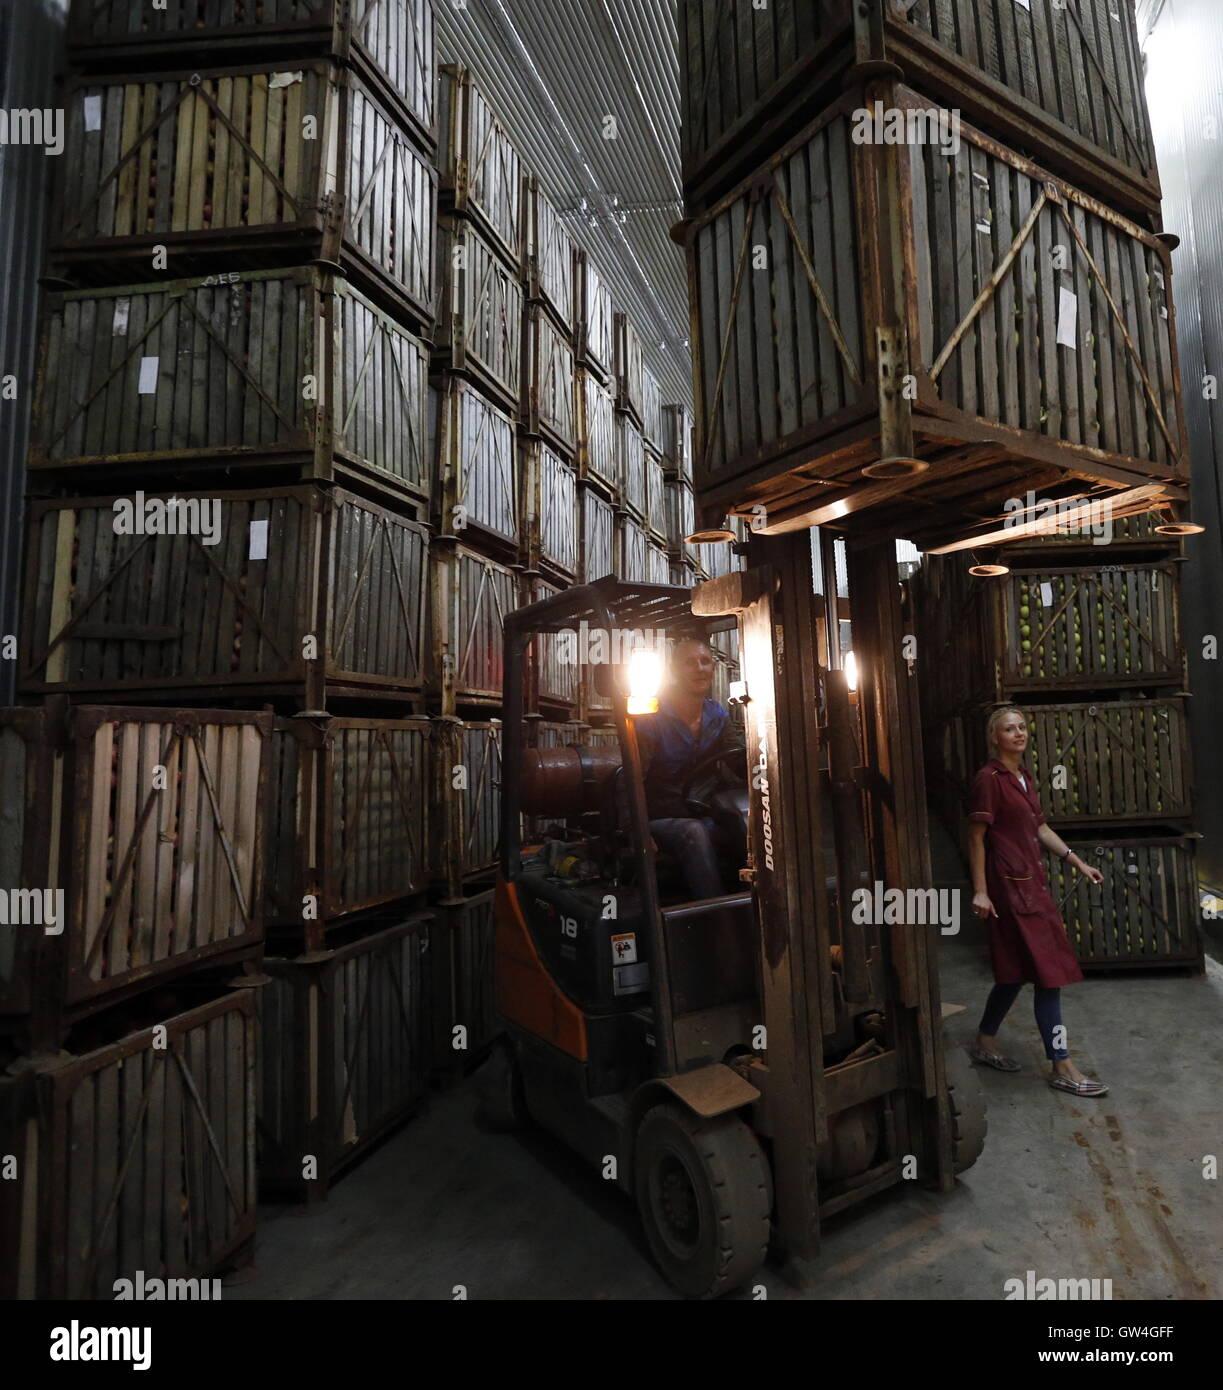 ROSTOV REGION, RUSSIA - SEPTEMBER 10, 2016: A fruit storage at the Krasny Sad farm company. Valery Matytsin/TASS - Stock Image